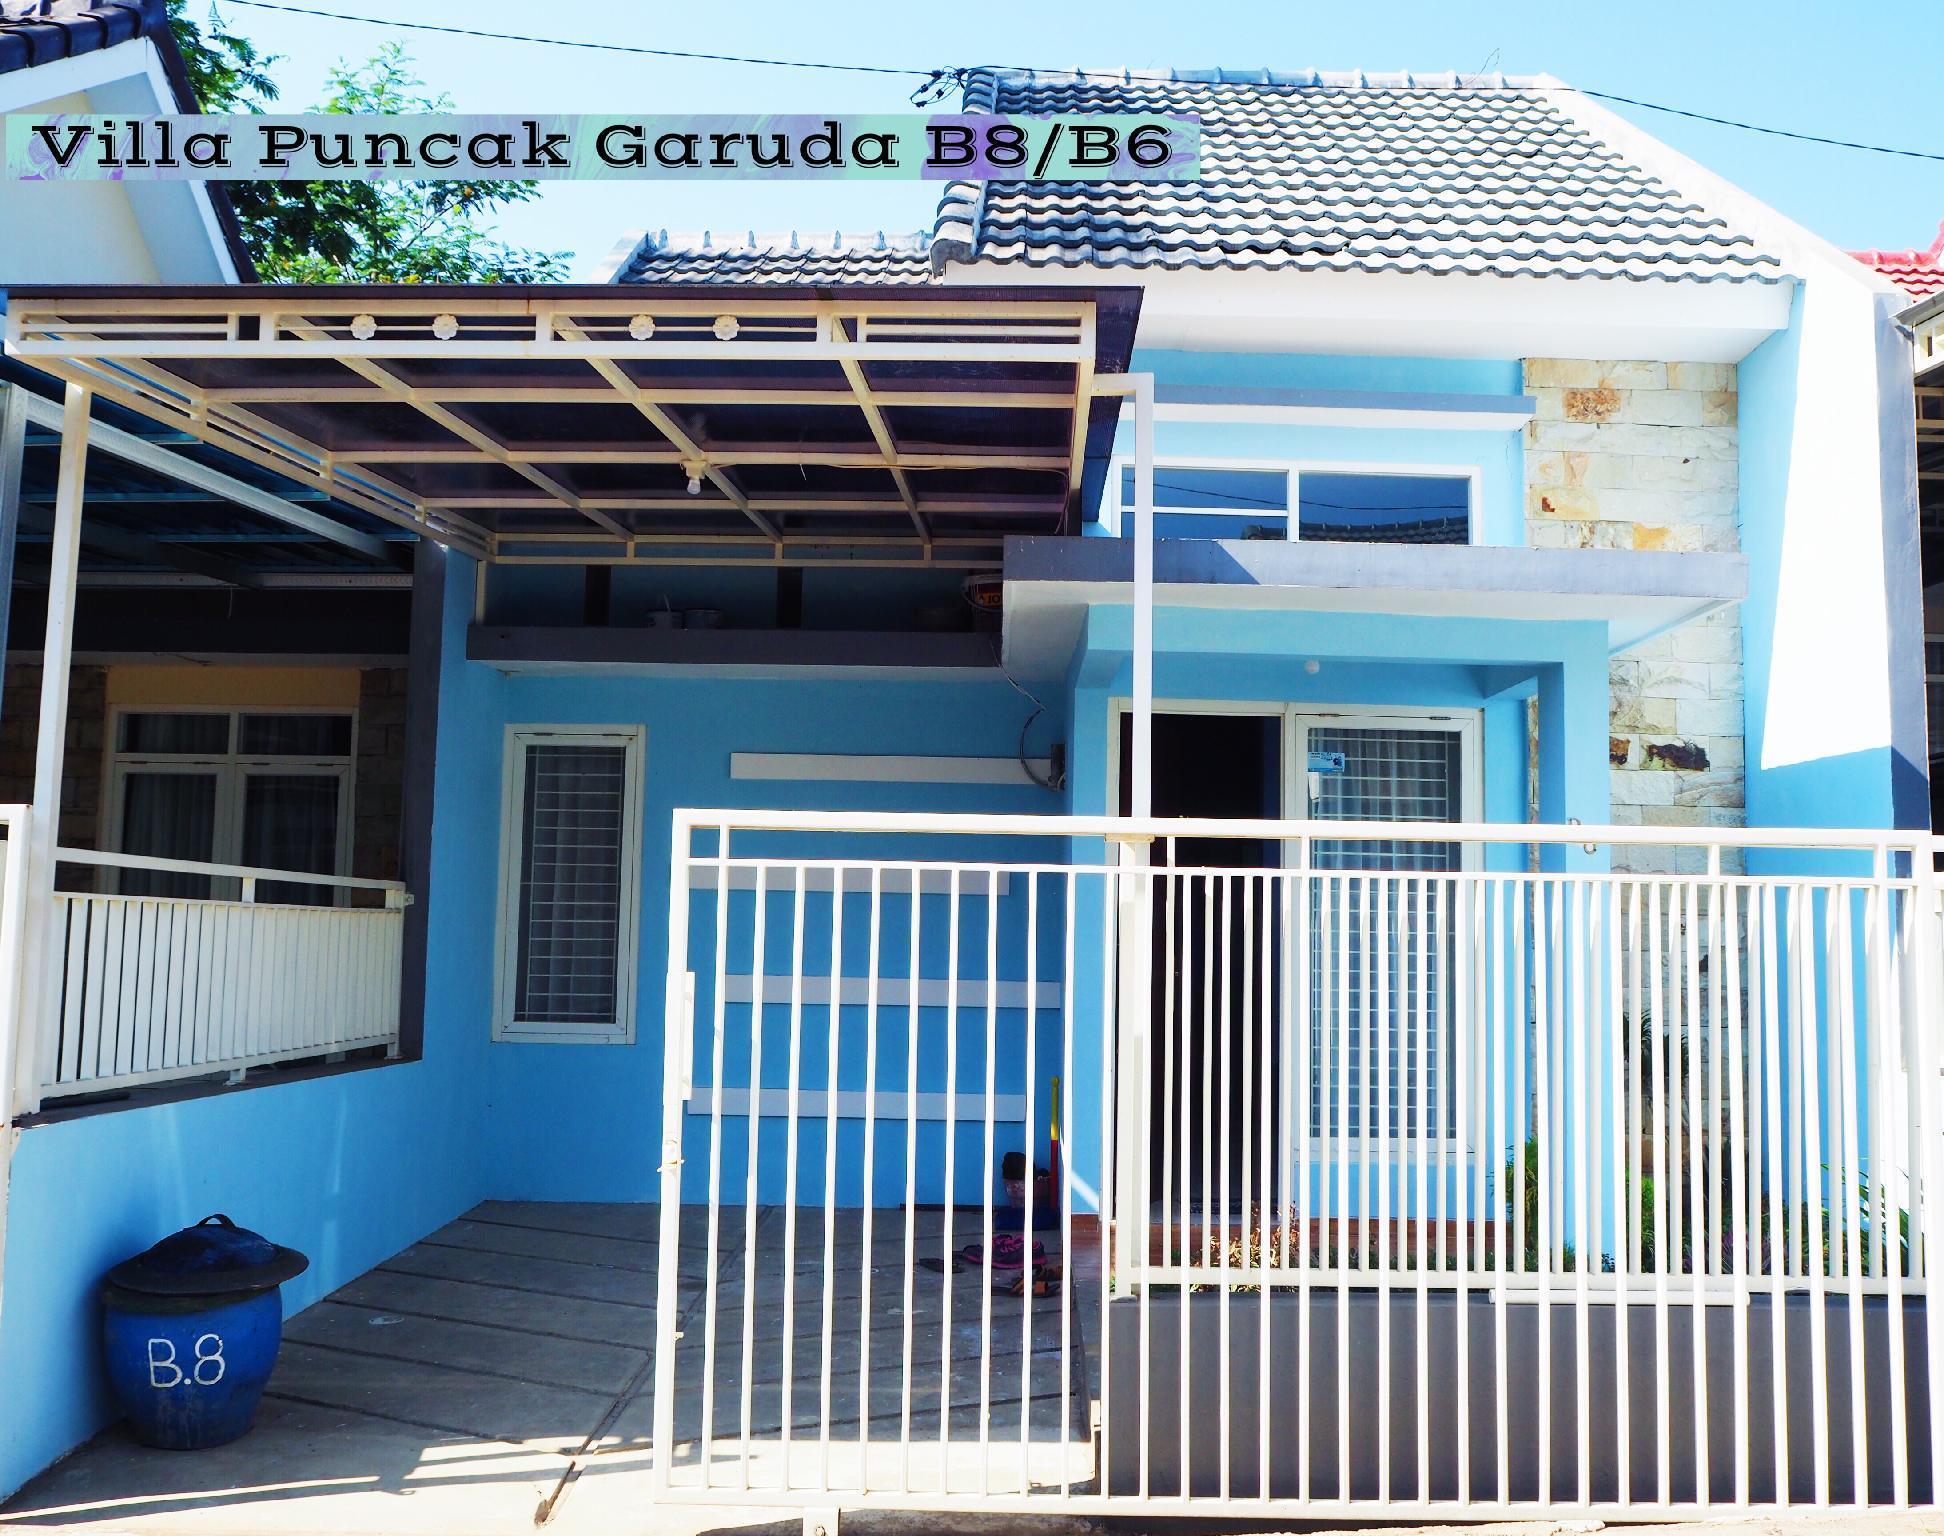 Villa Puncak Garuda B8